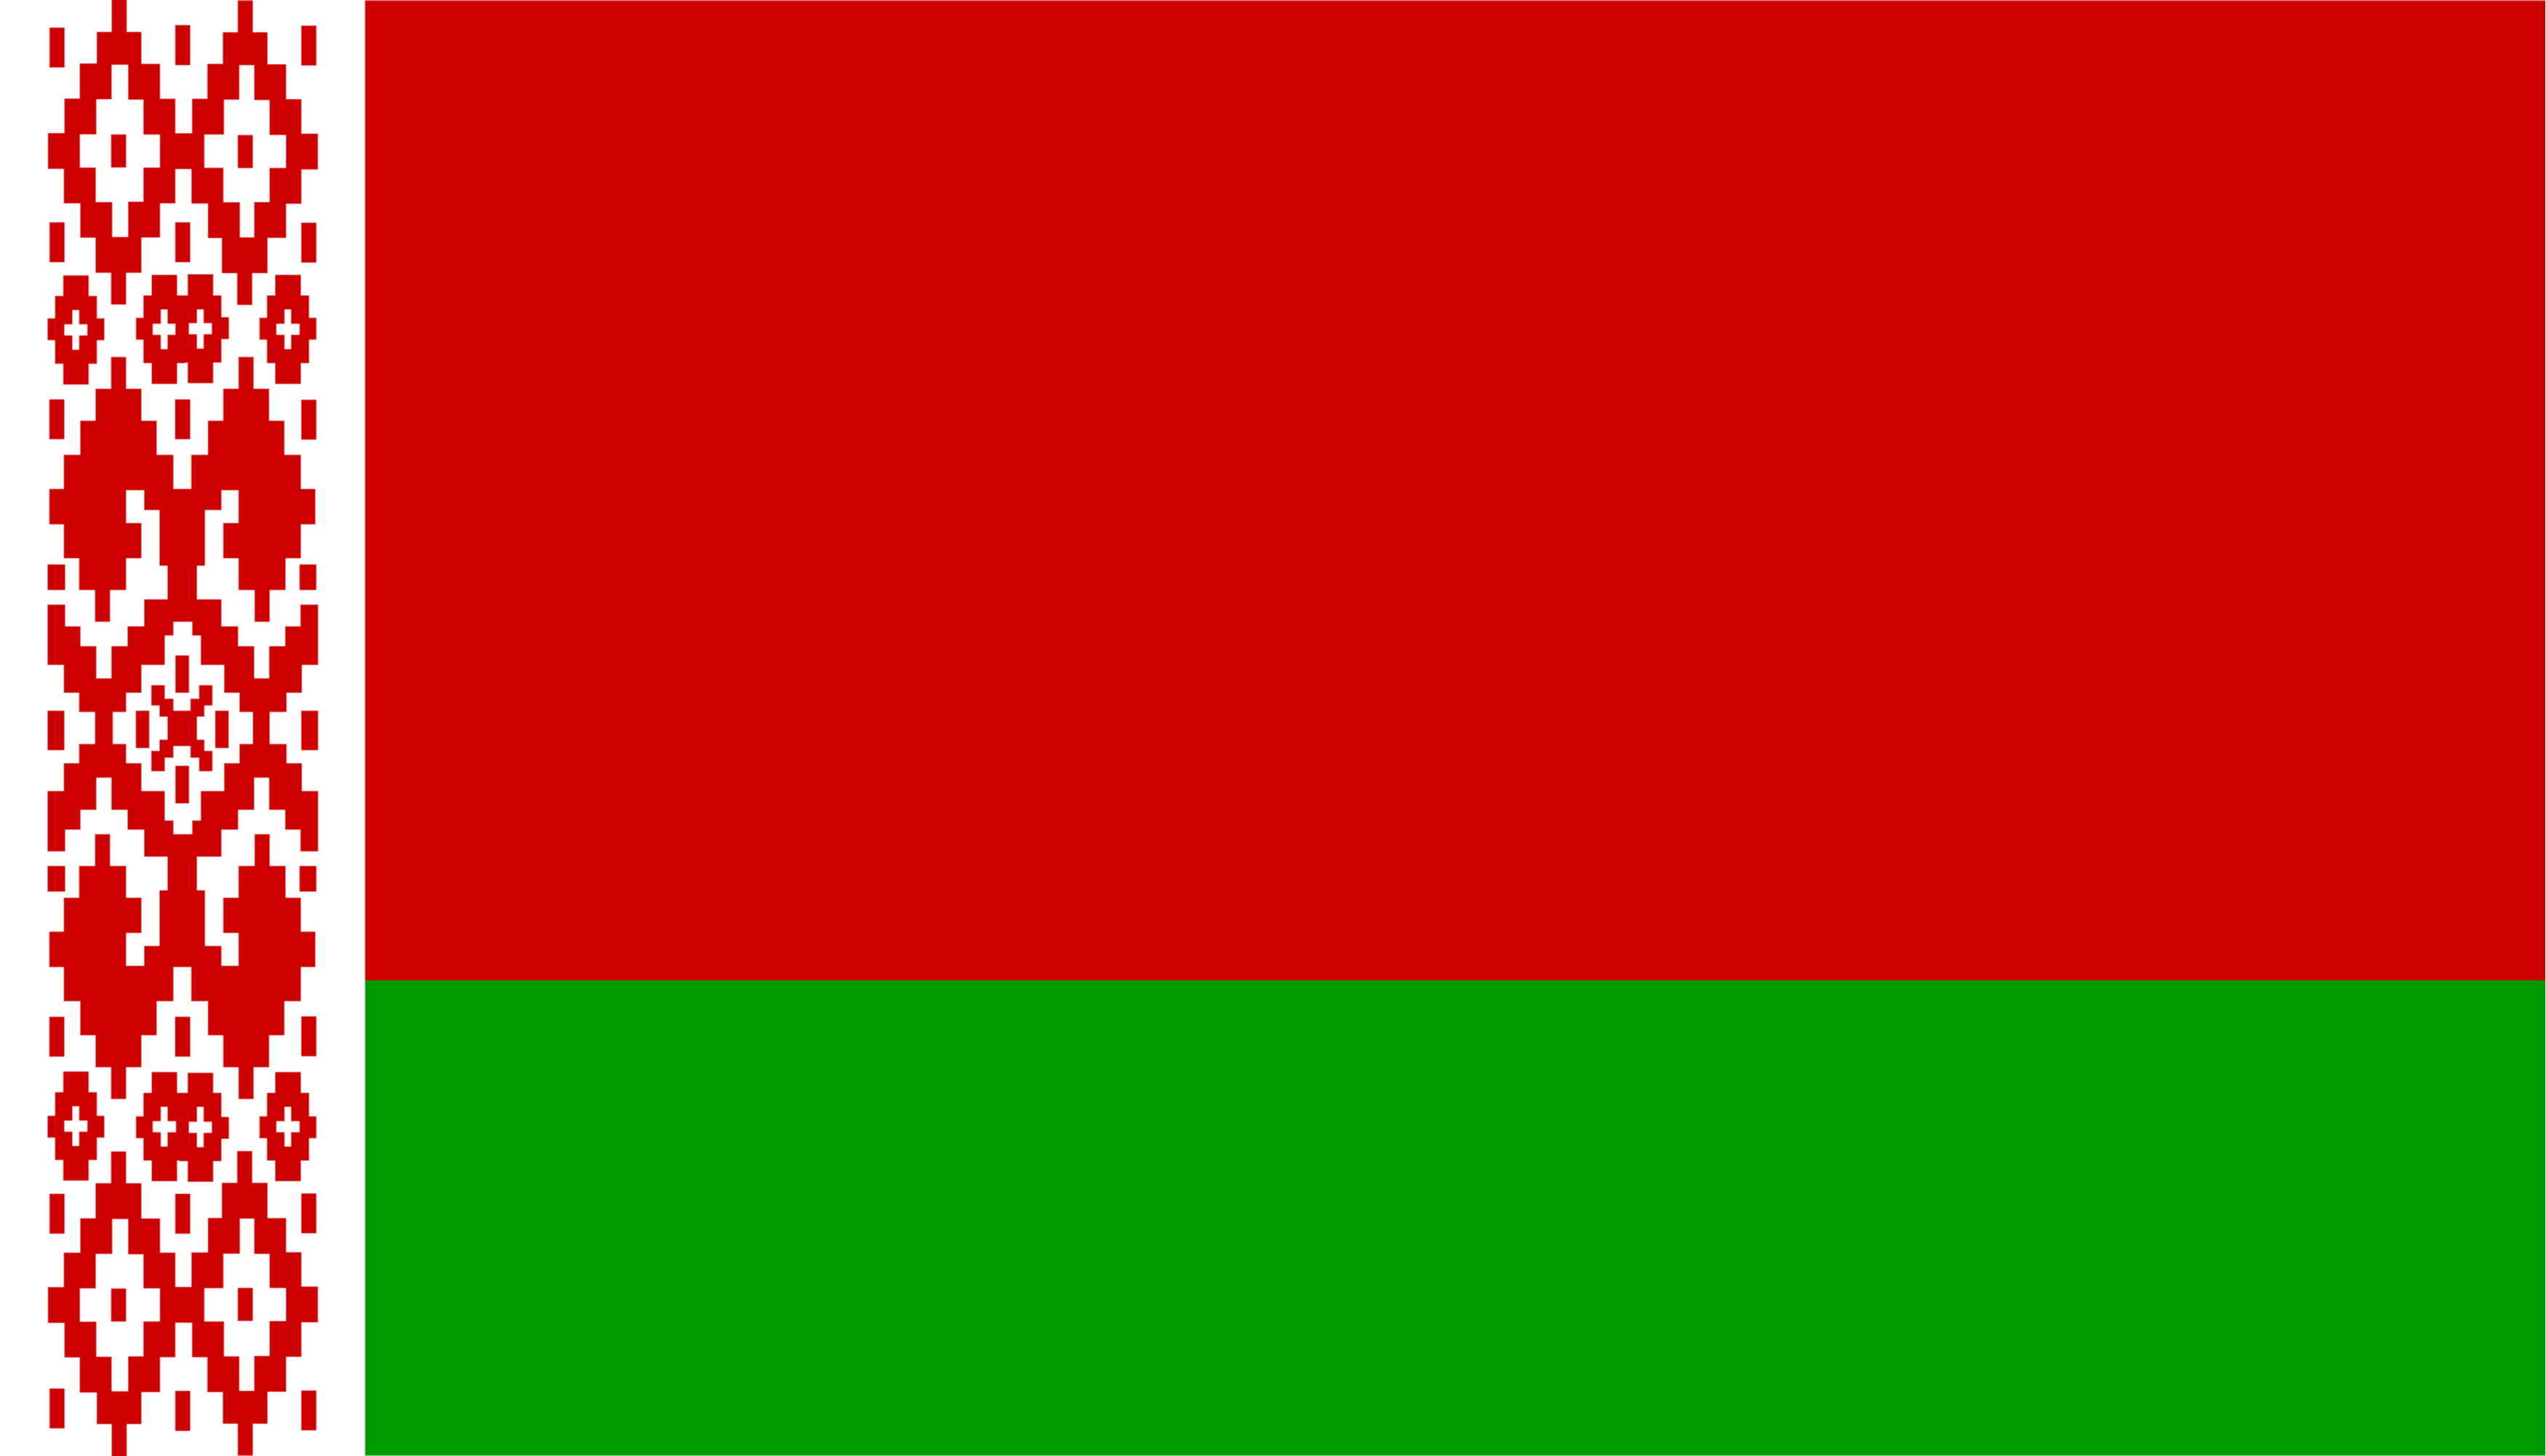 Miscellaneous: Belarus Metal Bell Minsk is the Capital of Belarus Bronze Colo